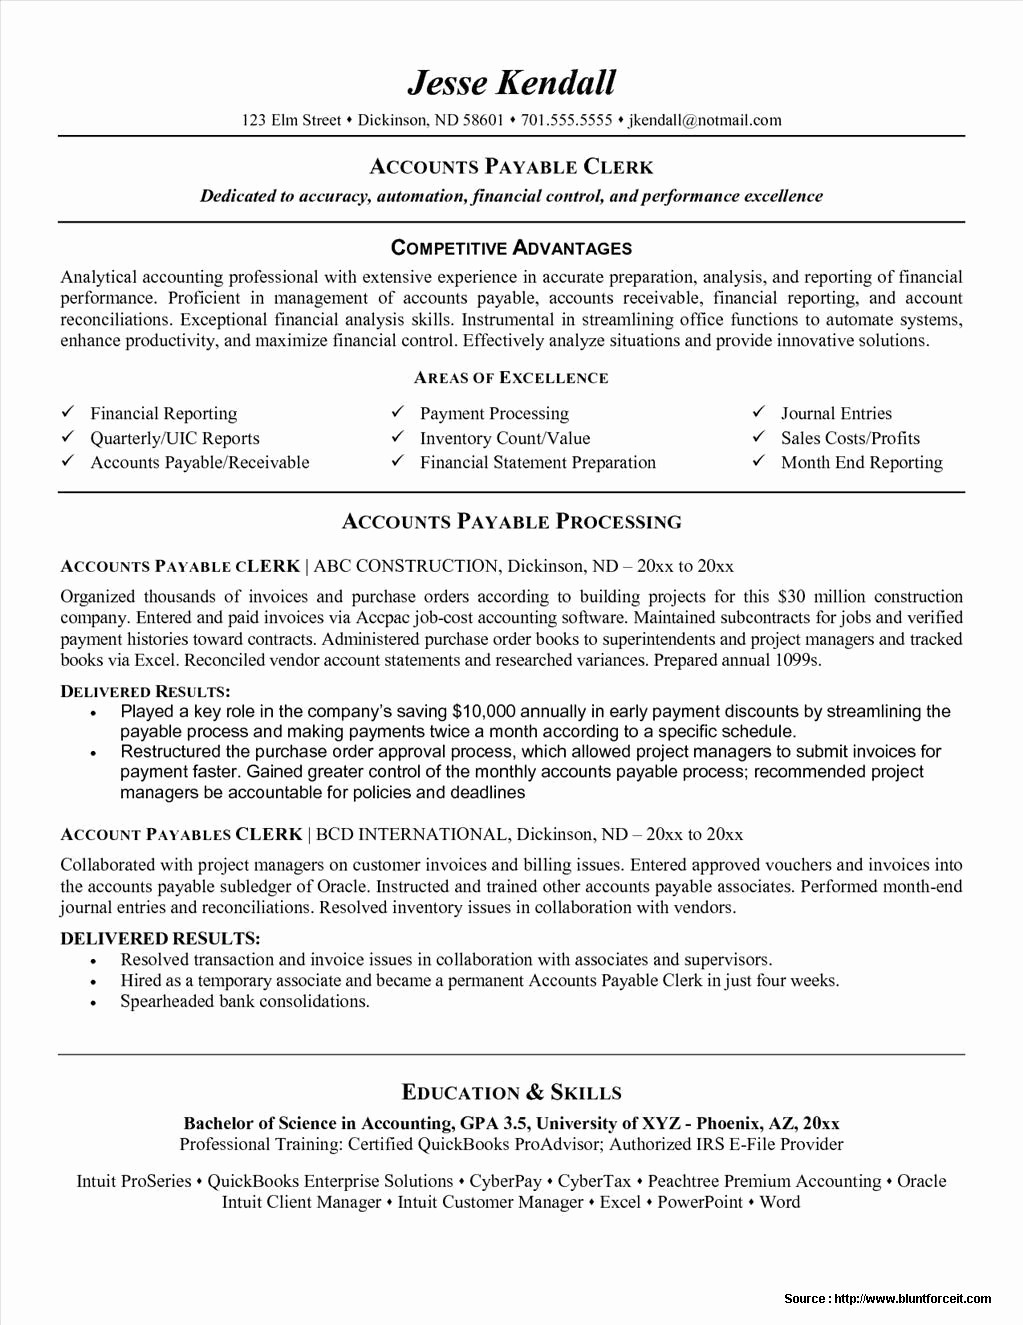 Microsoft Word Resume Template 2017 Elegant Accounts Payable Resume Template Microsoft Word Resume